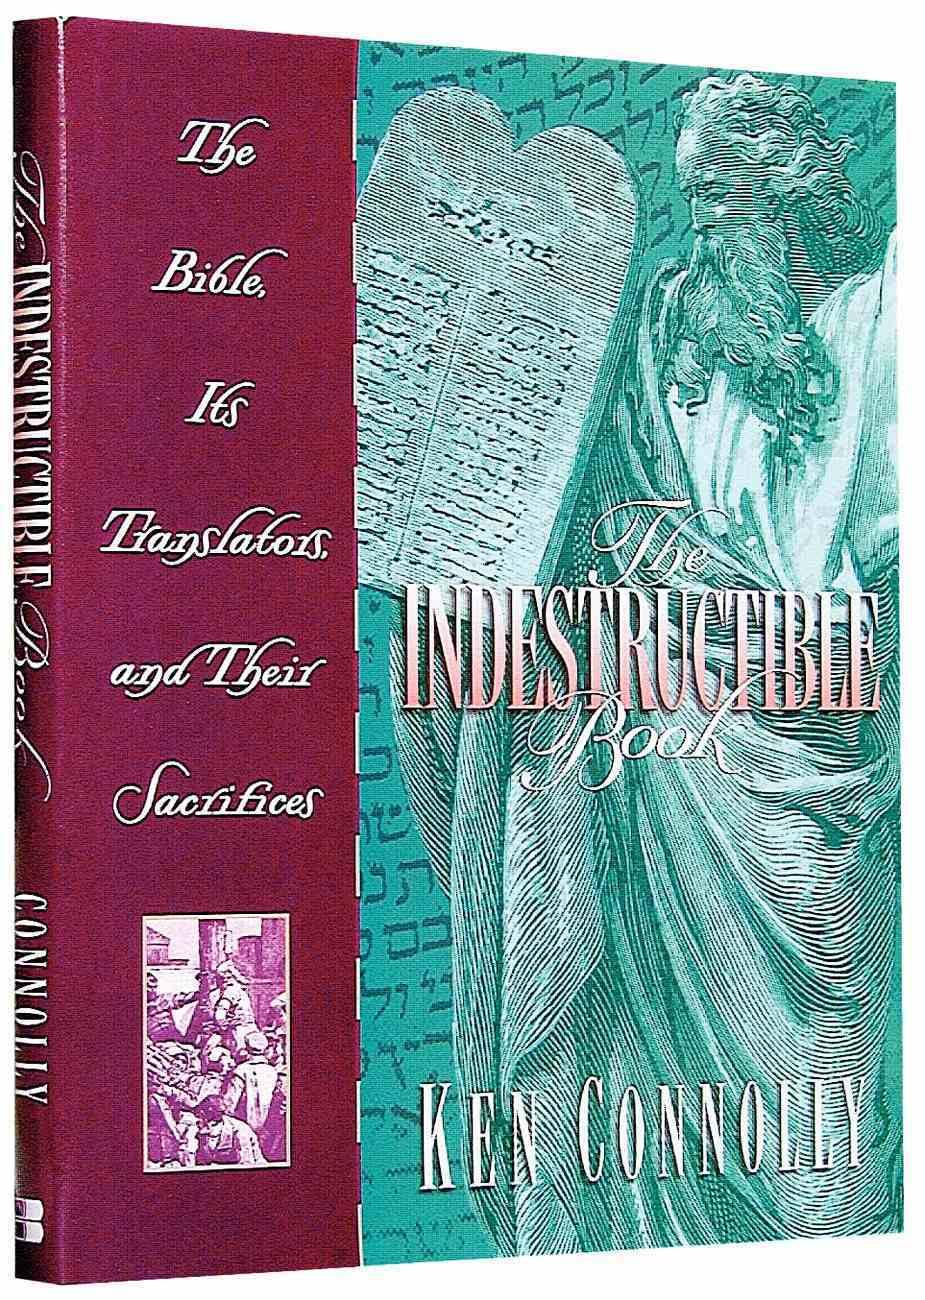 Indestructible Book Hardback